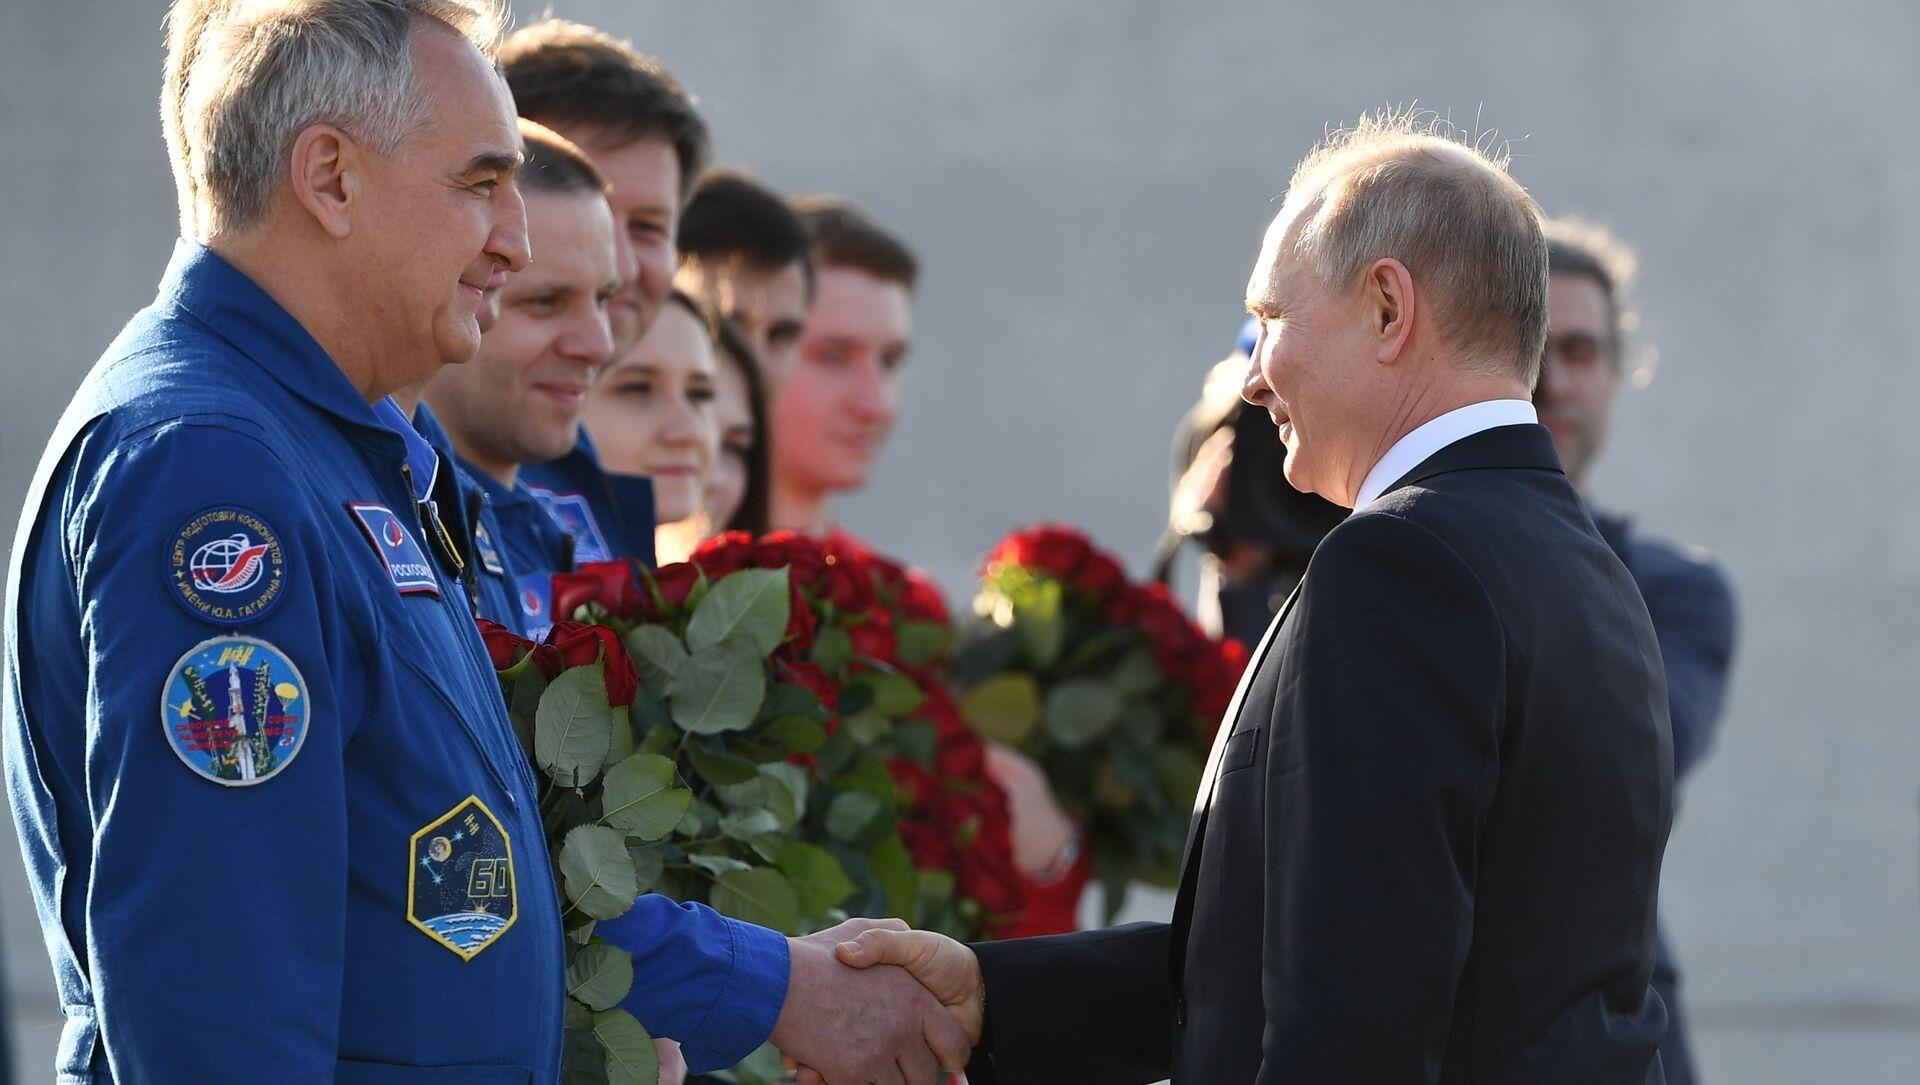 Vladimir Putin ha visitato il monumento a Yury Gagarin  - Sputnik Italia, 1920, 12.04.2021